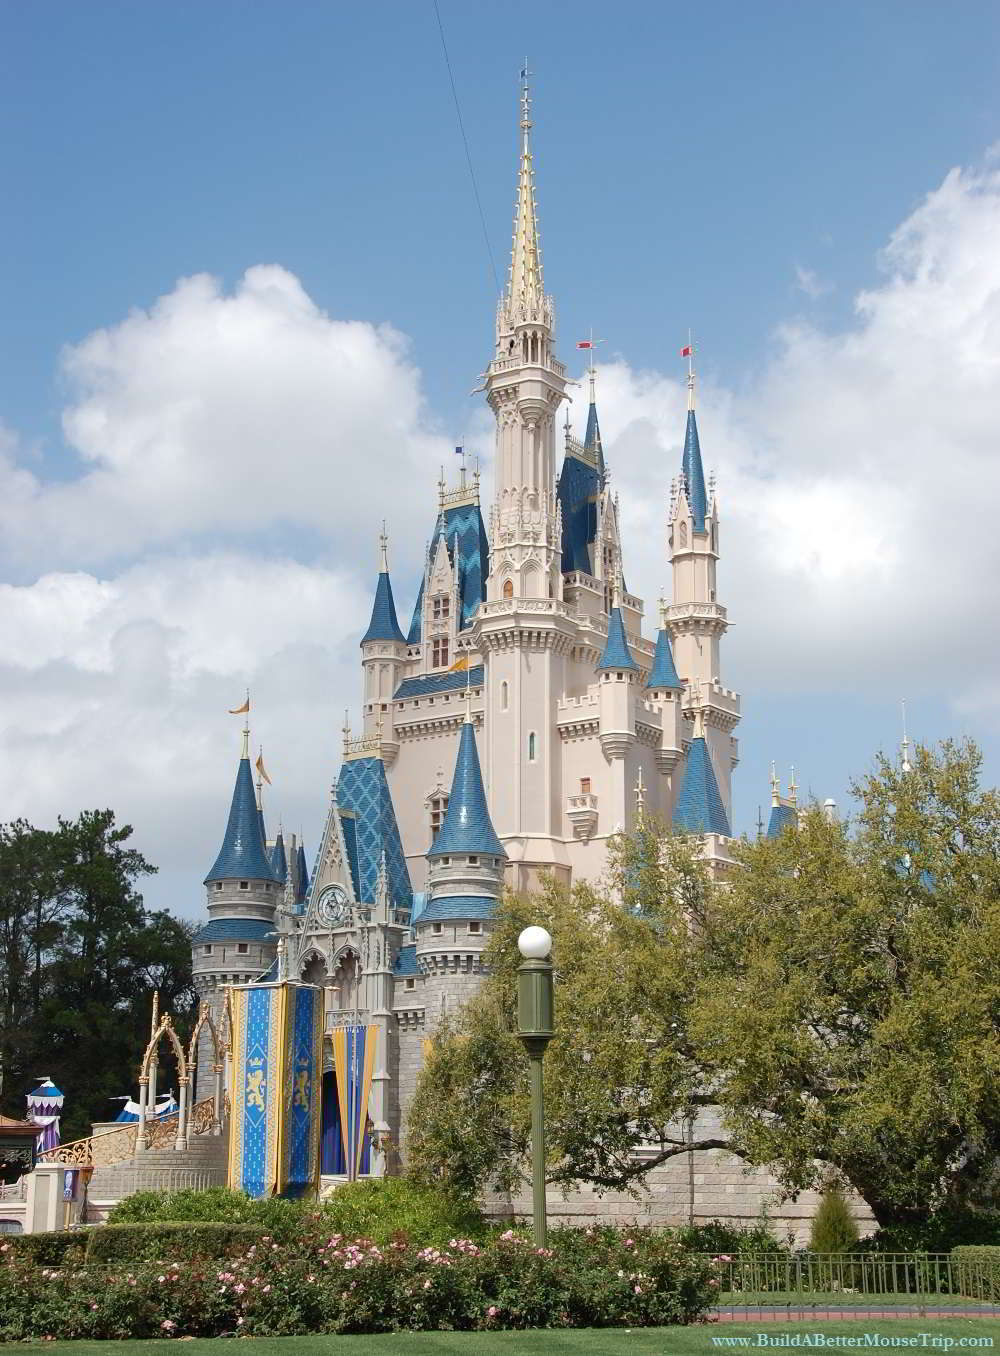 Cinderella's Castle in the Magic Kingdom at Walt Disney World Resort.